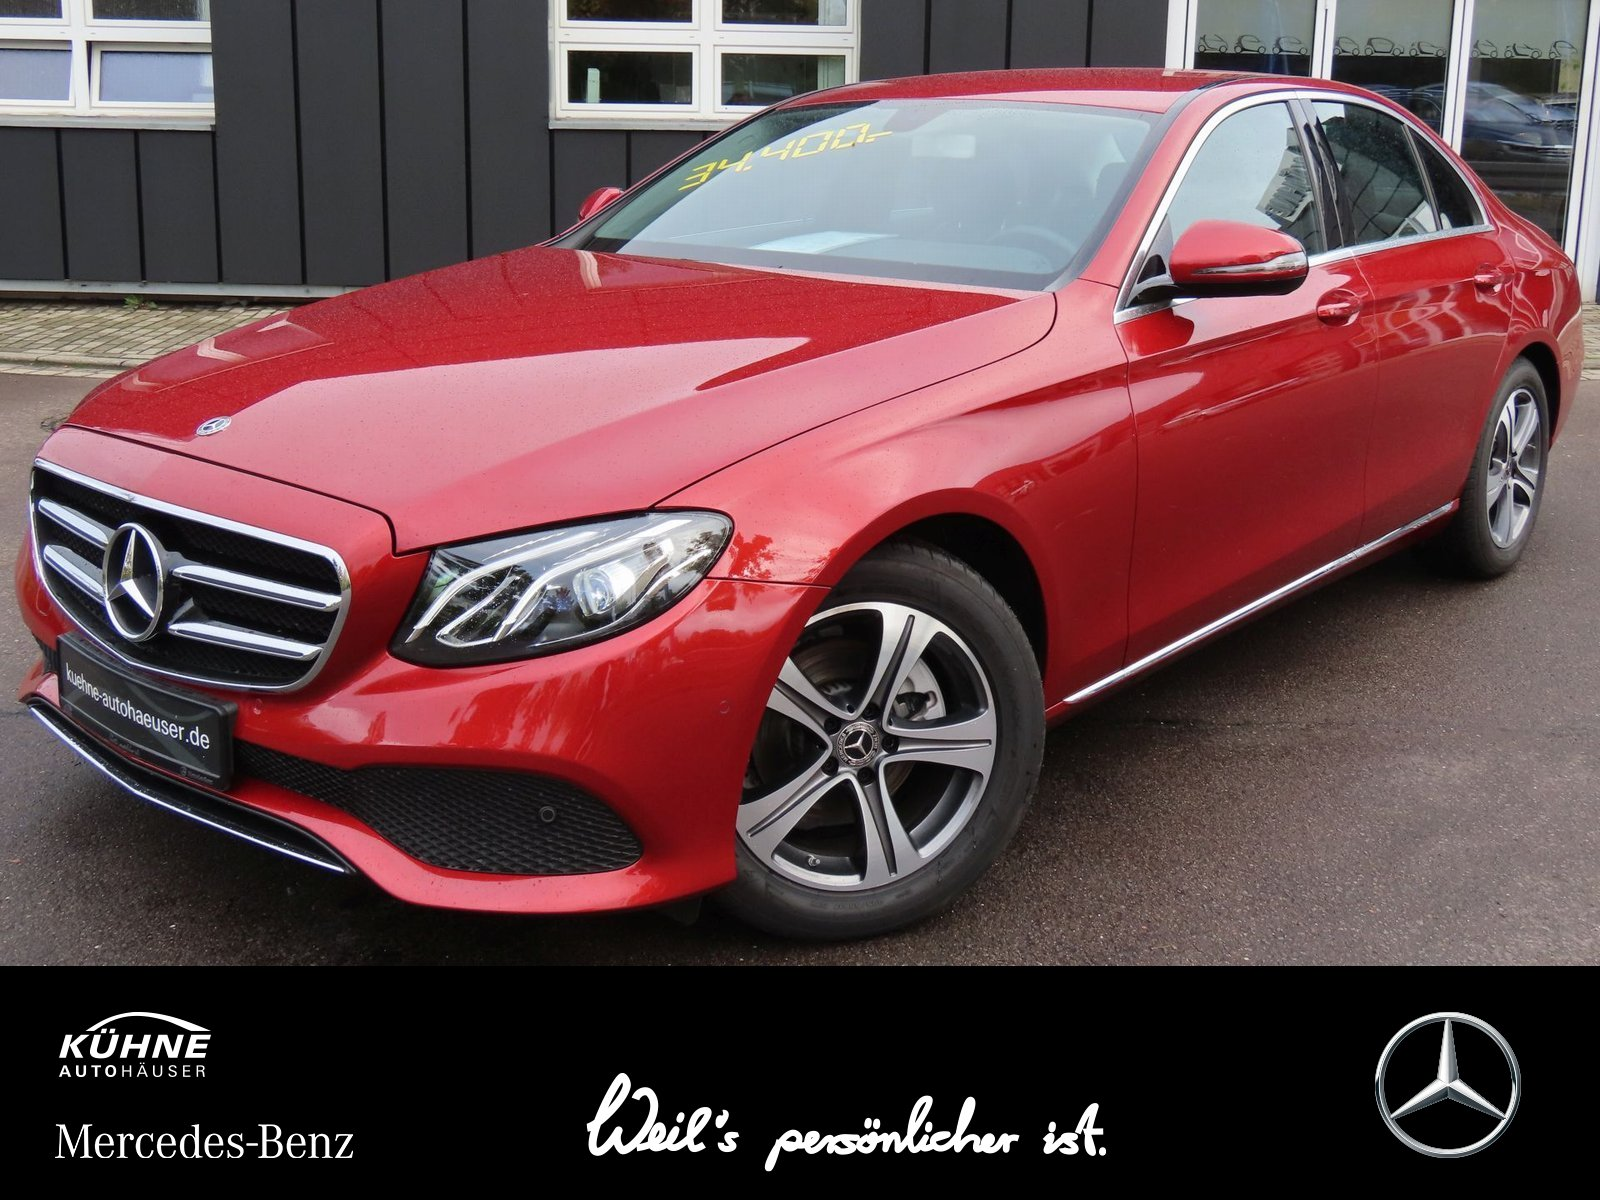 Mercedes-Benz E 200 d Avantgarde+AHZV+Business+Kamera+DigiRadi, Jahr 2019, Diesel